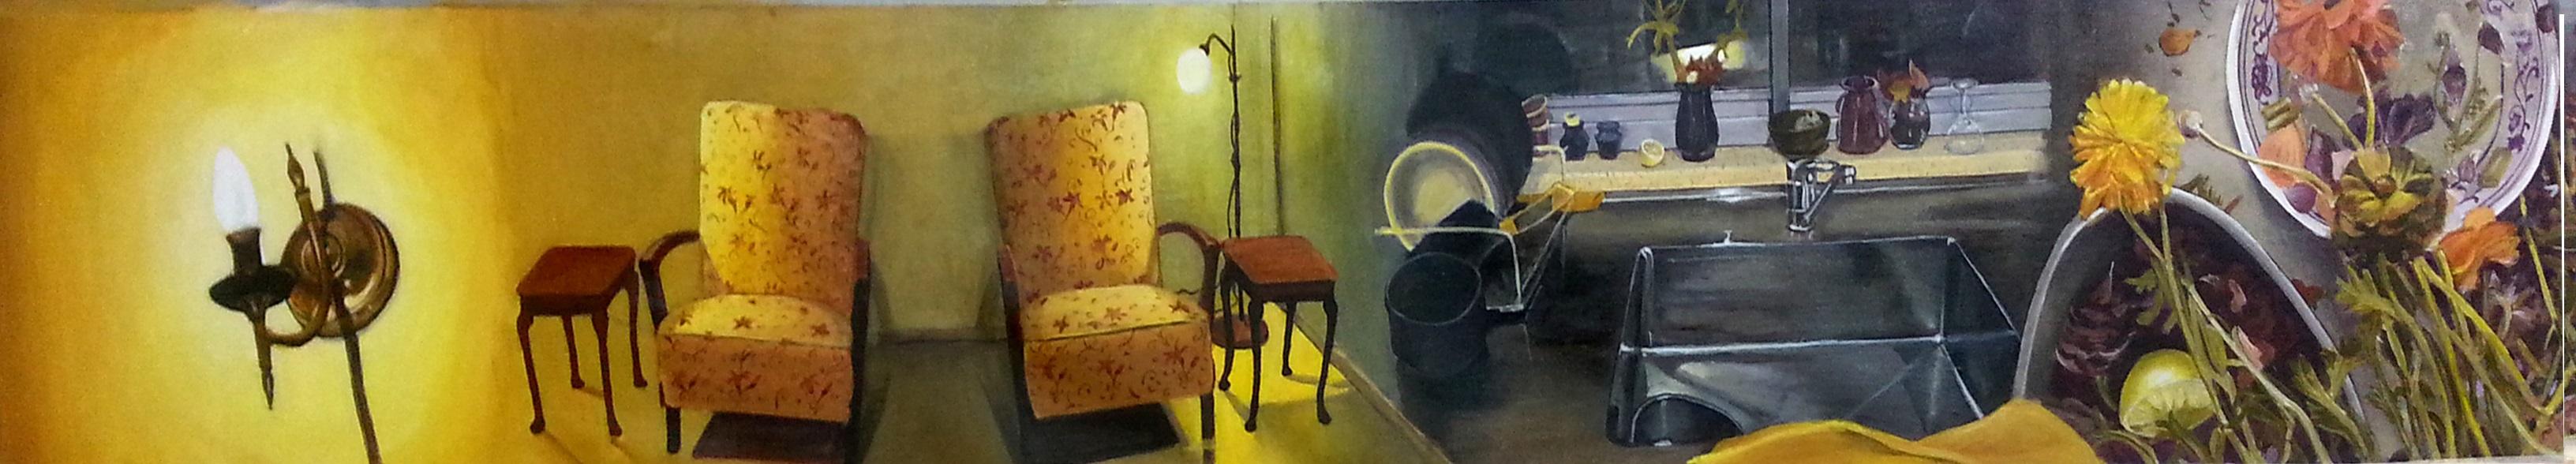 dvora morag,Color Separation-Yellow, 2014, acrylic on canvas,0.335x2